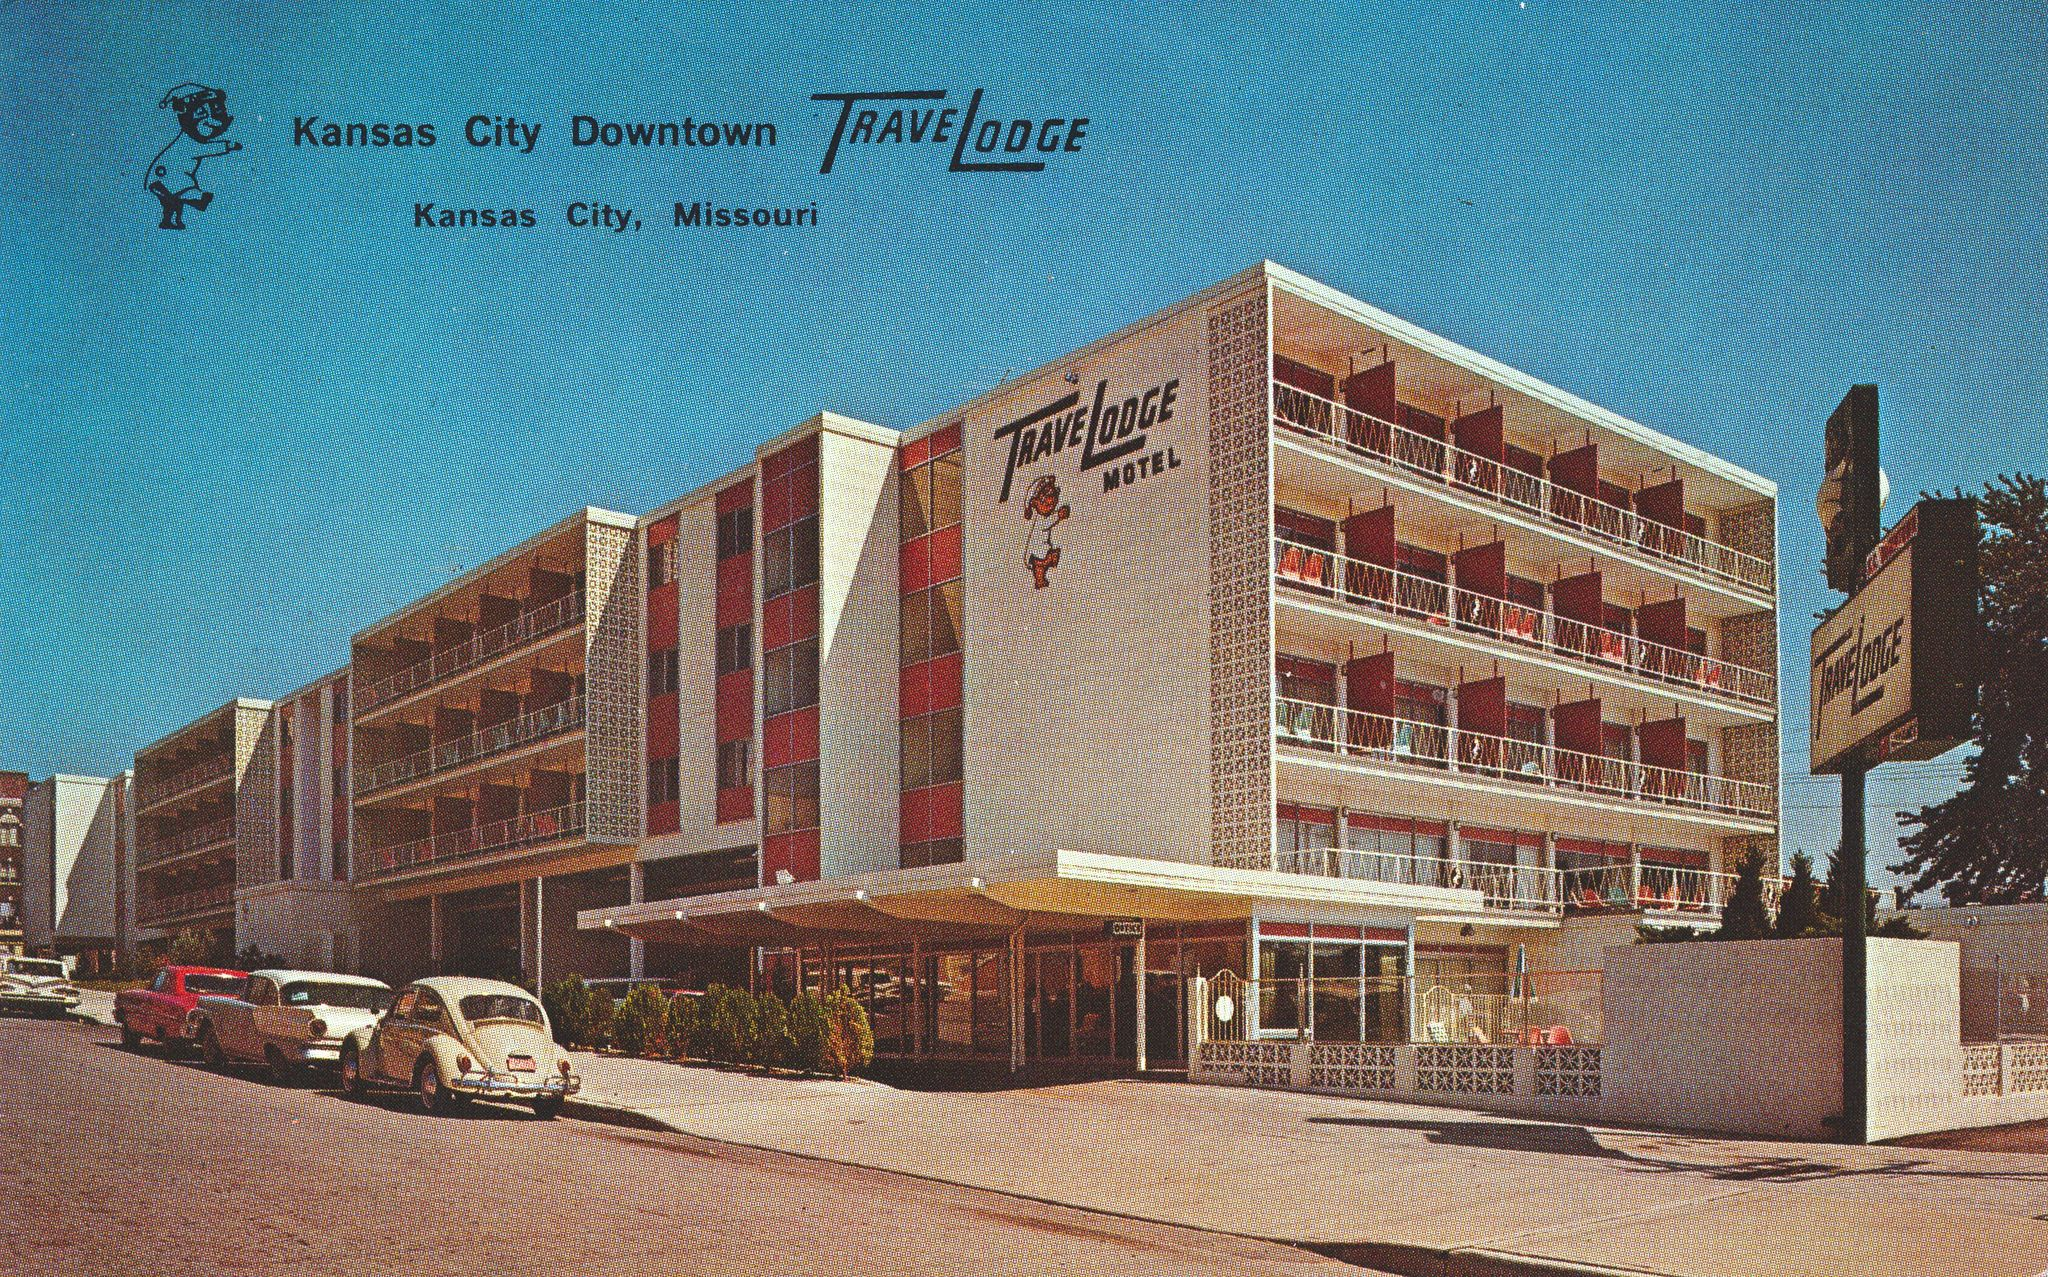 Travelodge Downtown Kansas City Missouri Century Hotel Hotel Motel Kansas City Downtown